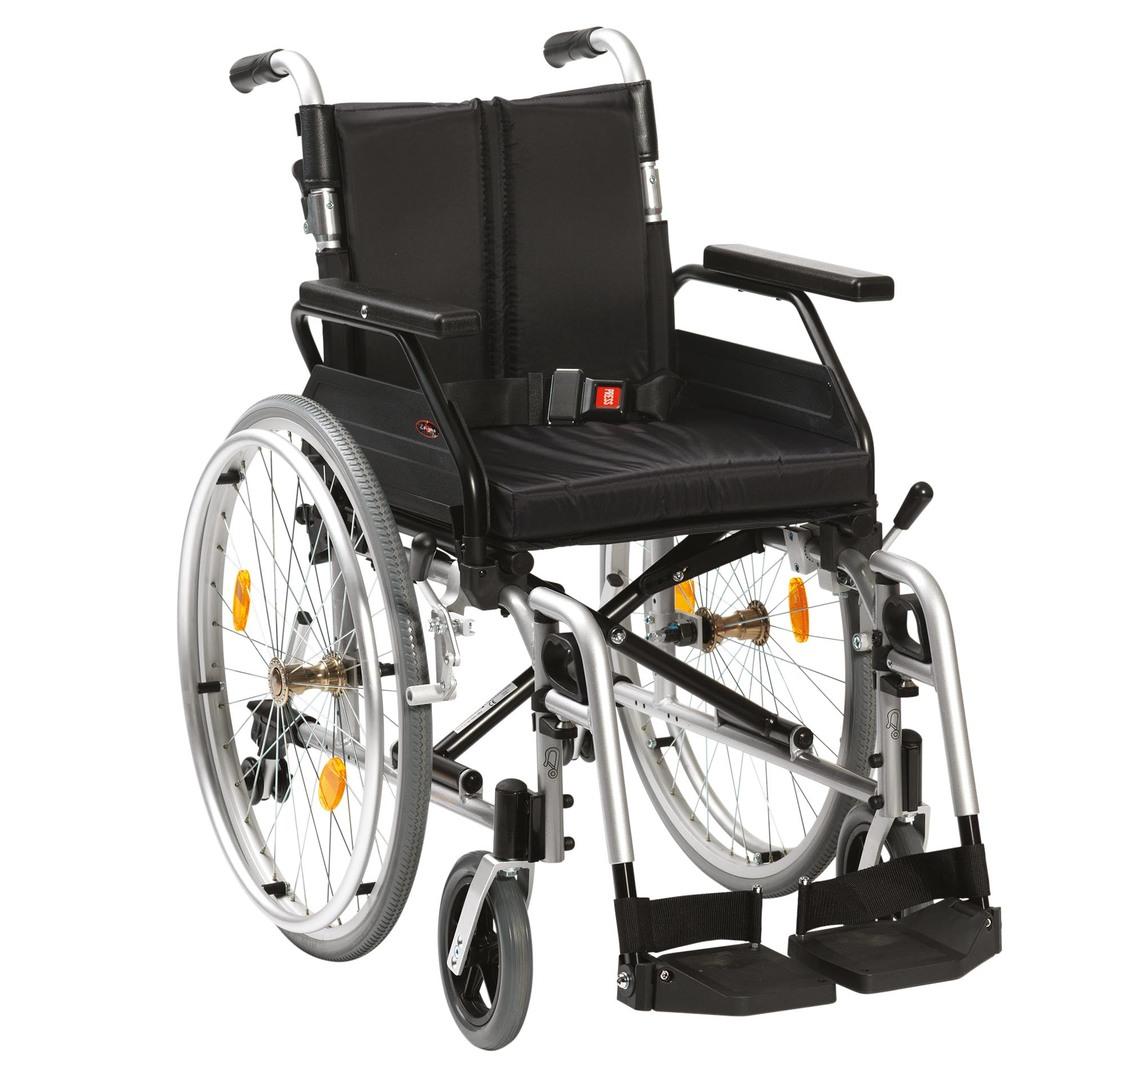 XS2_Wheelchair_1